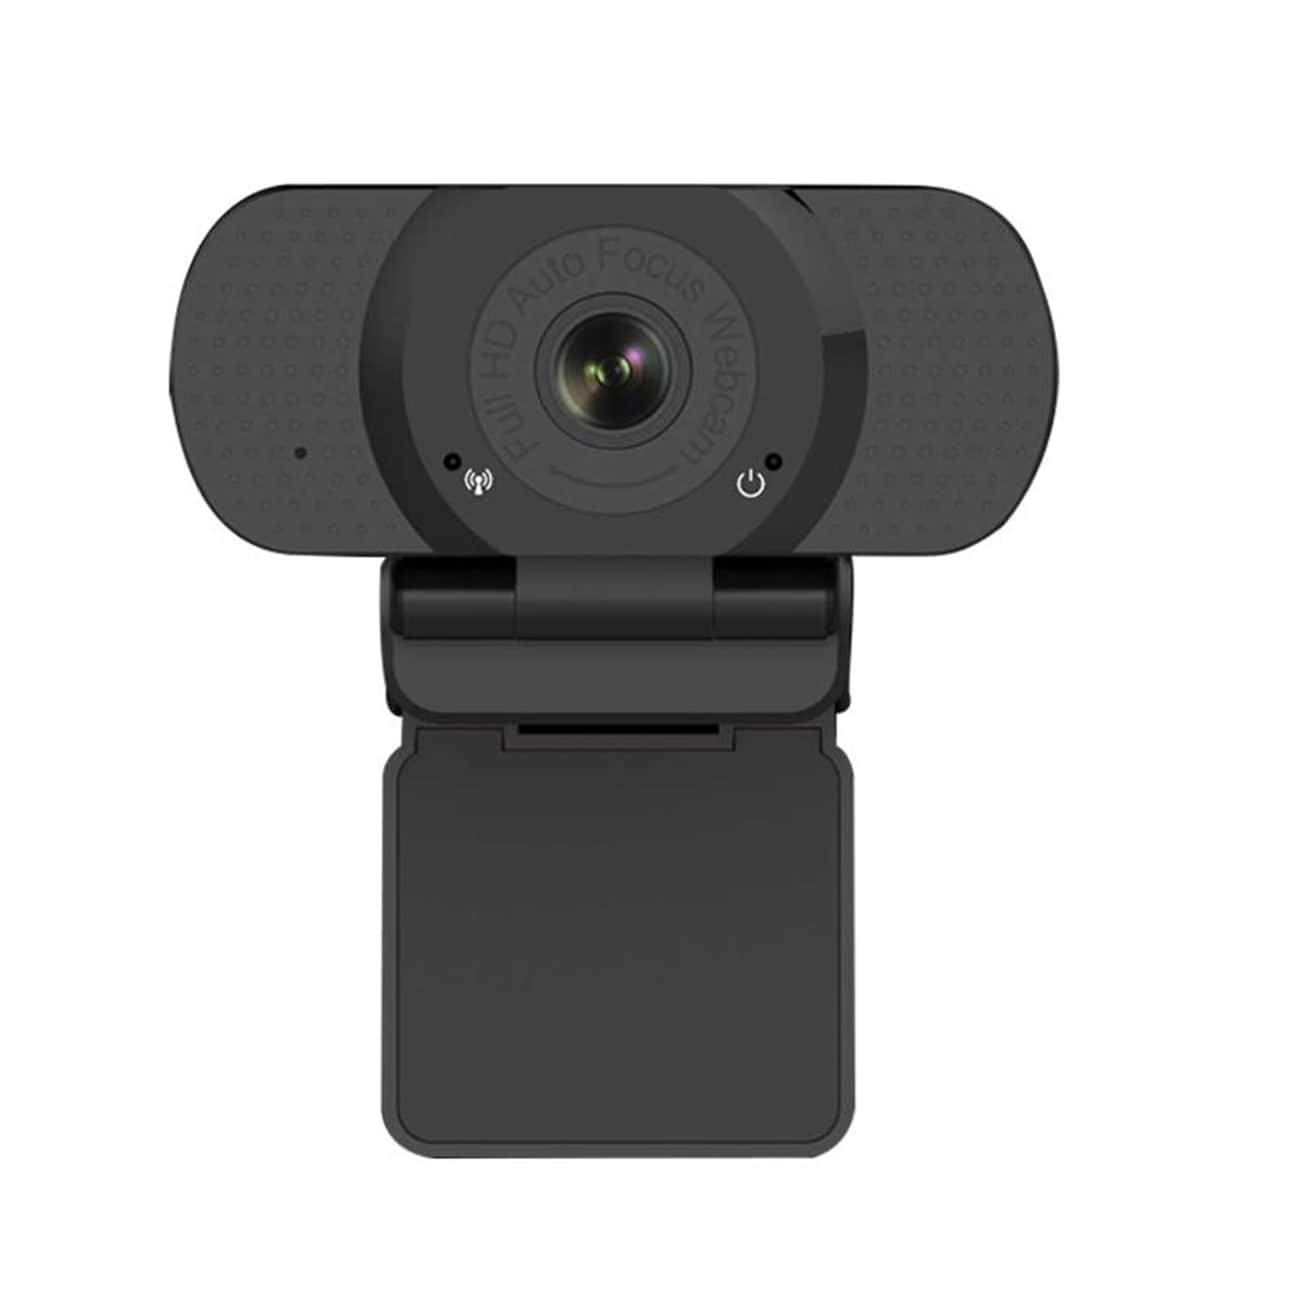 Gaming WebCam For Streaming USB FHD Microphone Camera Auto Focus SP-WCAM11 - 6